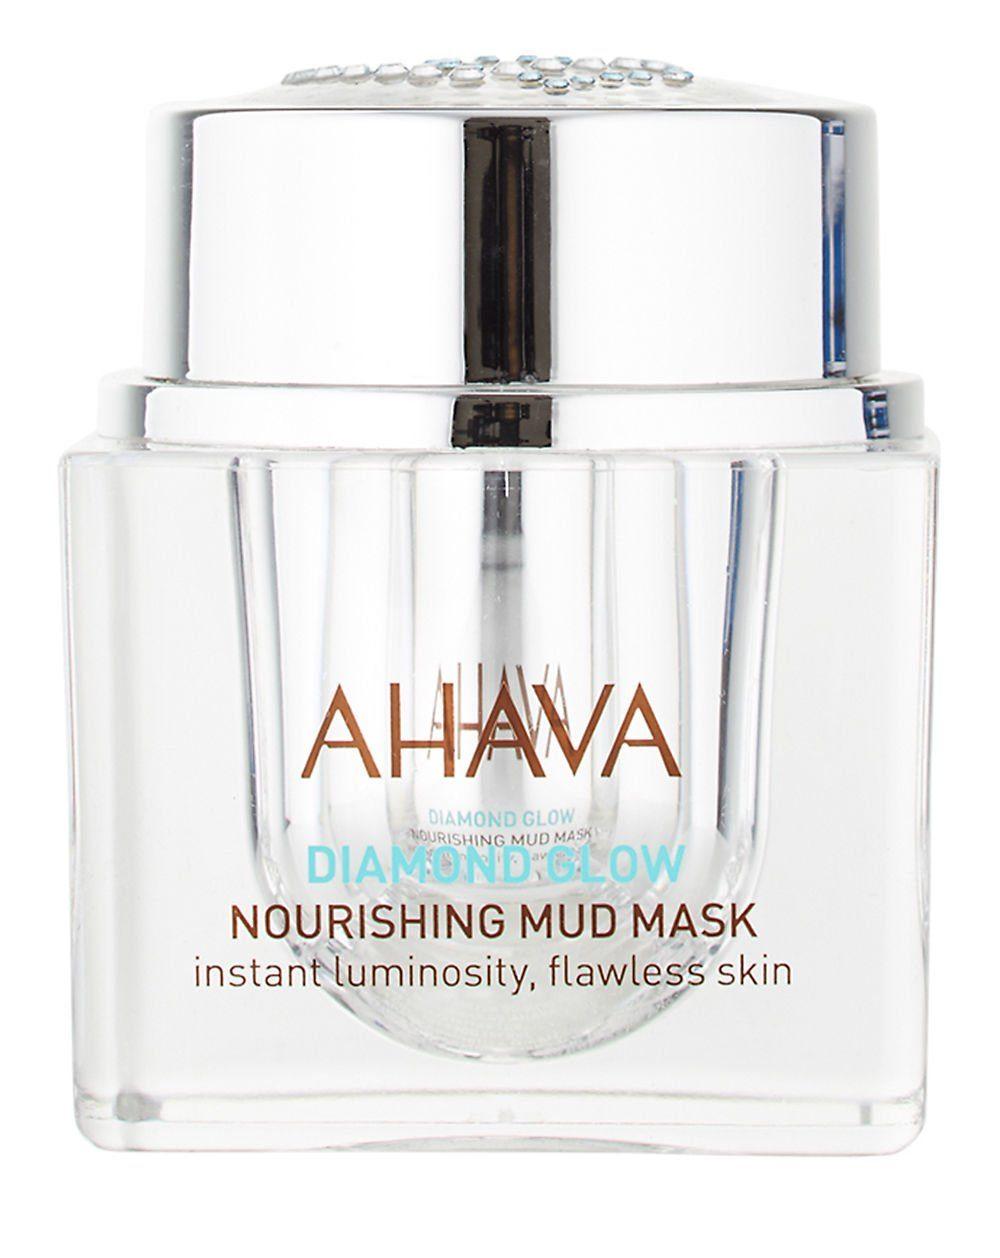 Ahava Gesichtsmaske »Diamond Glow Mud Mask«